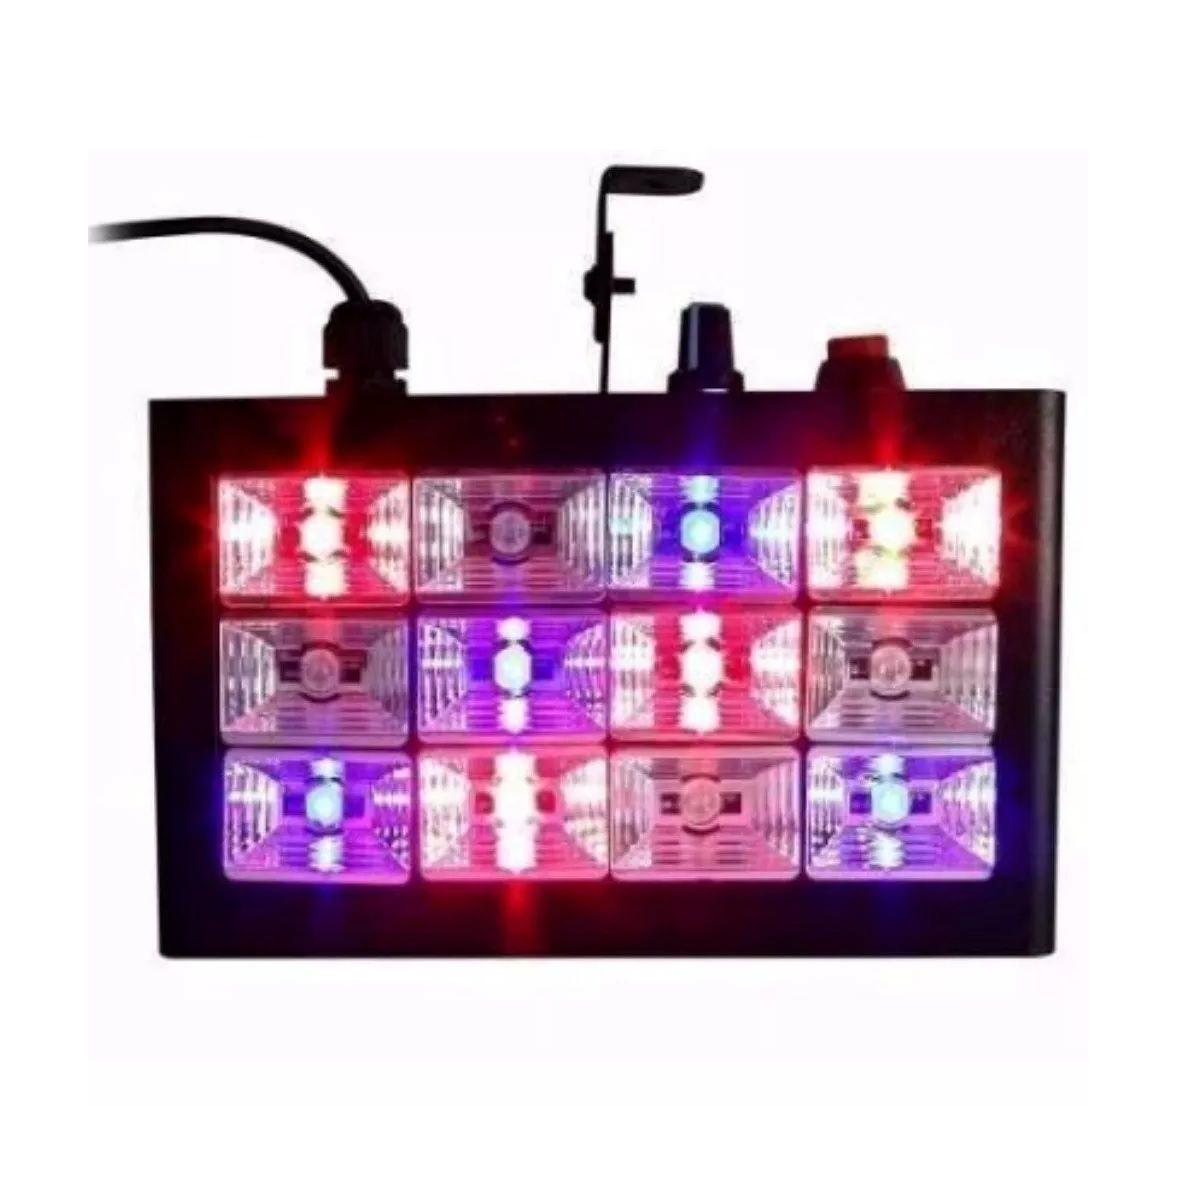 Kit 4x Strobo 12 Leds RGB 15W Rítmico Bivolt Automático